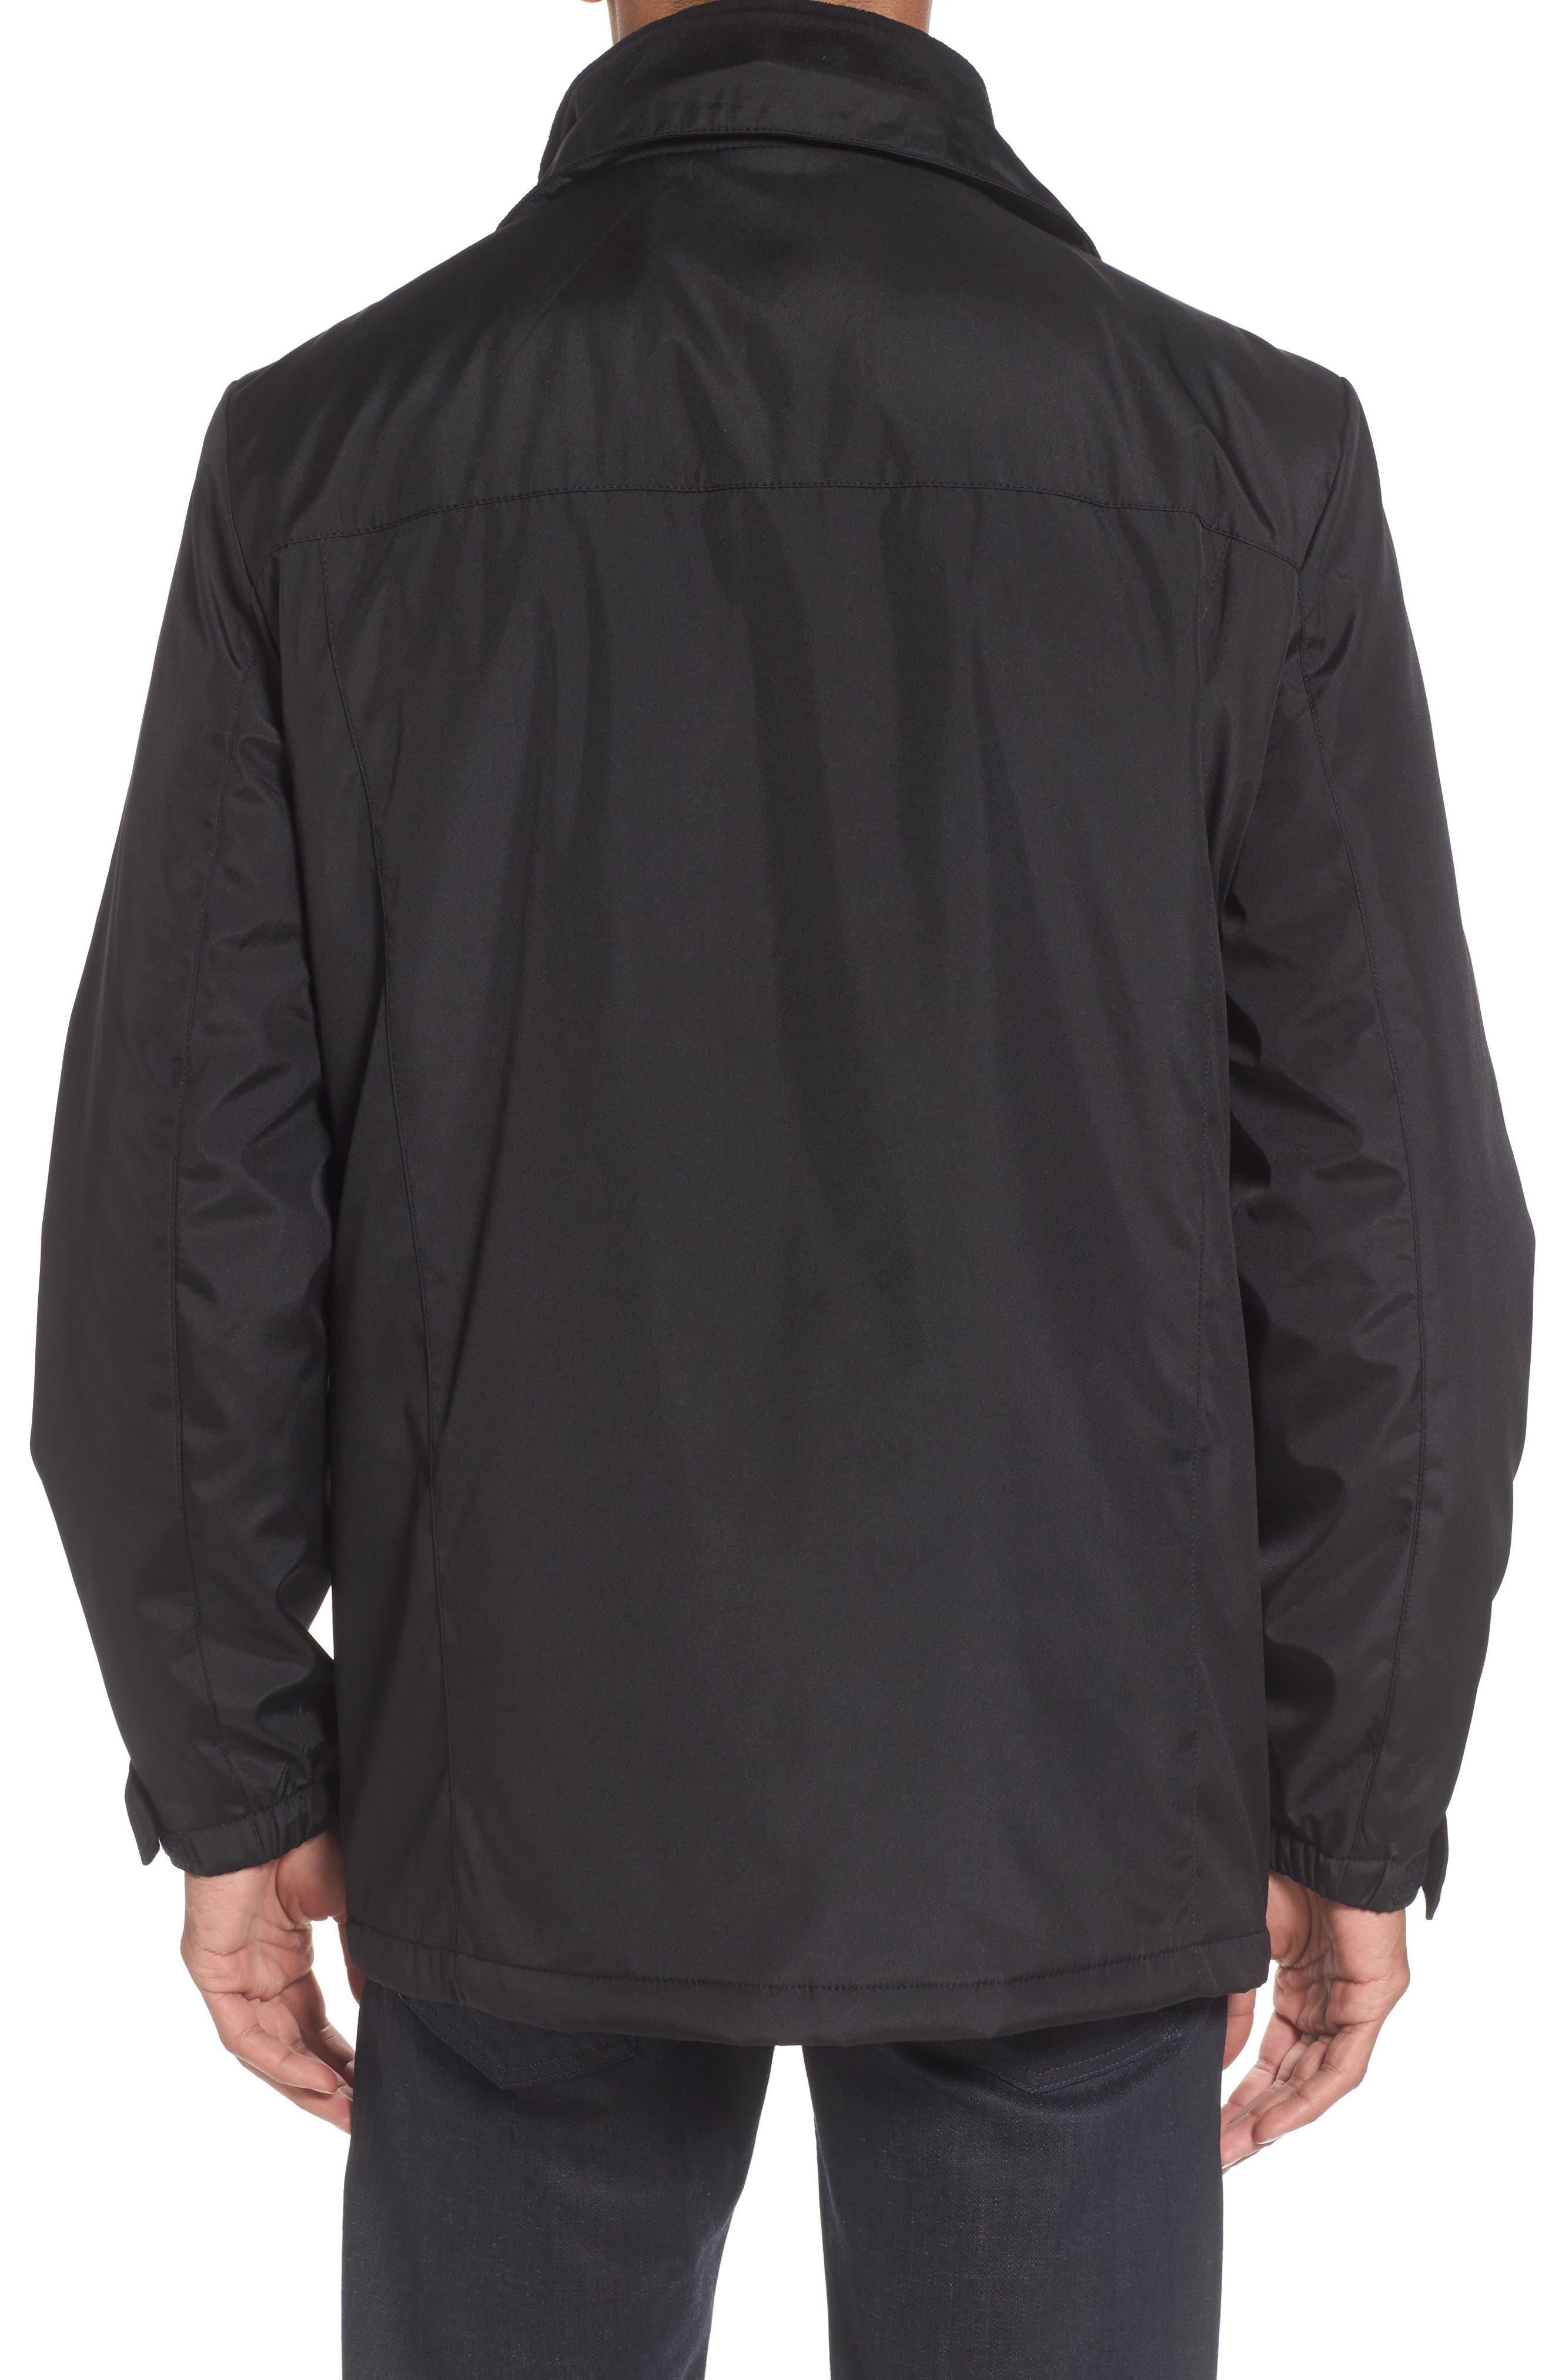 Hooded Jacket with Inset Fleece Bib,                             Alternate thumbnail 4, color,                             001